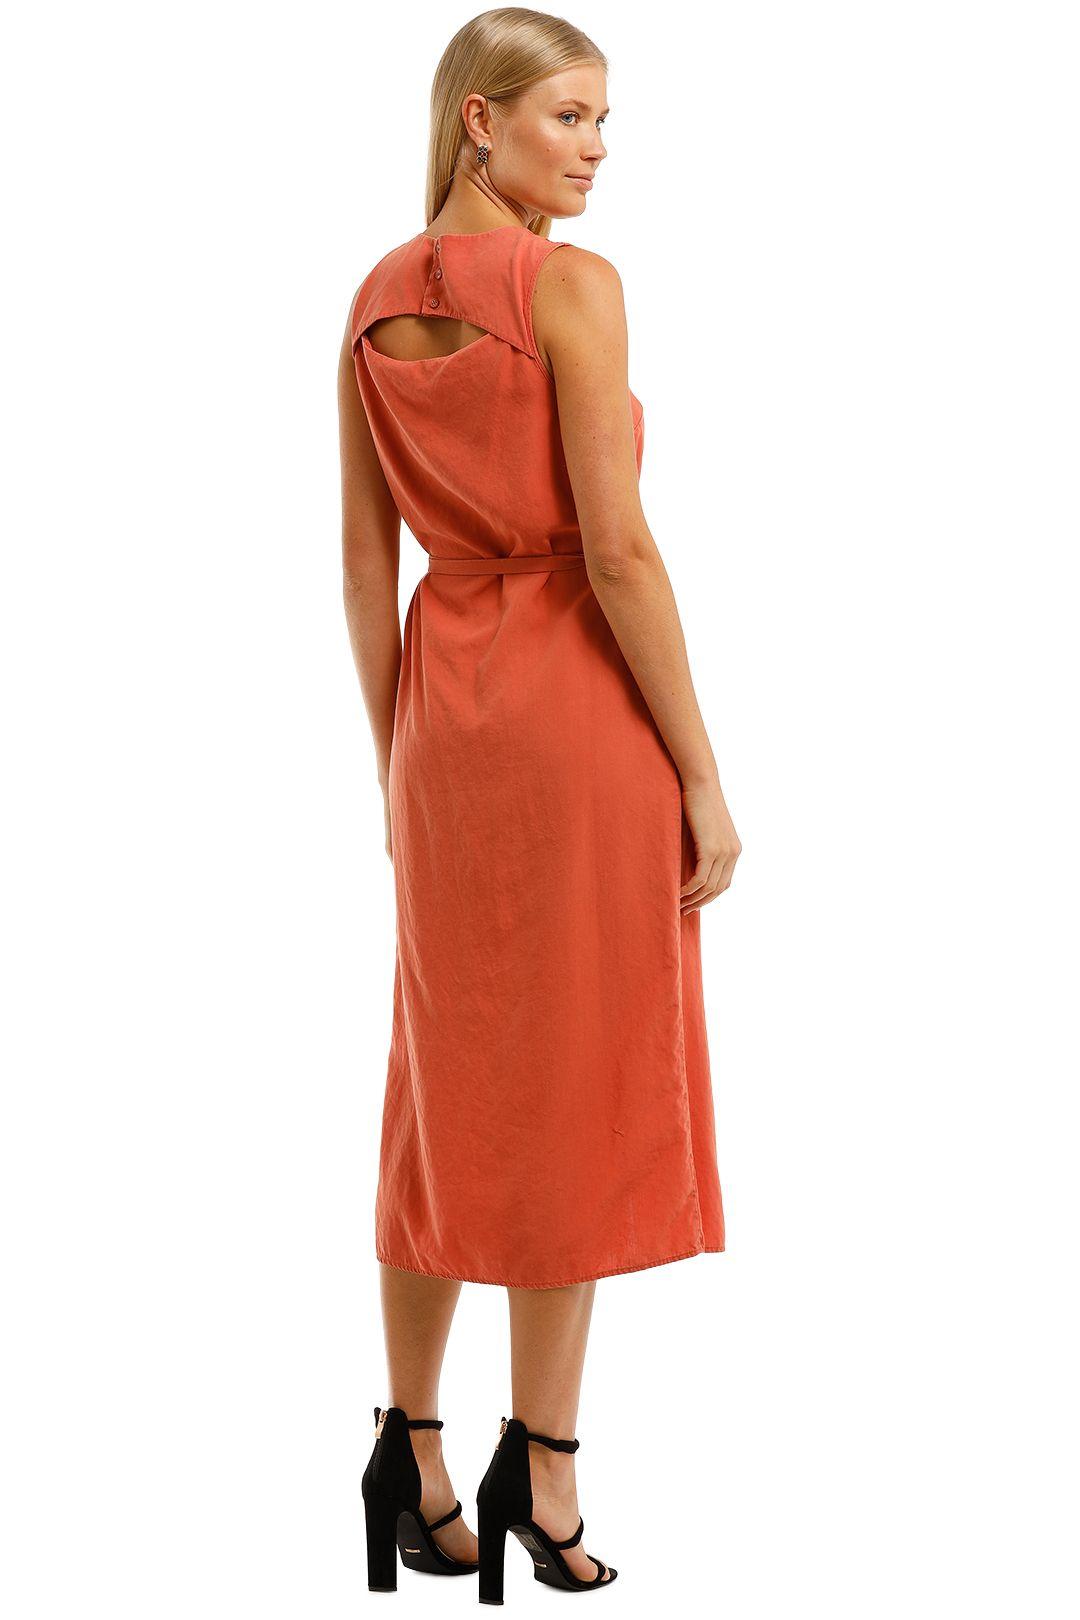 Saints-The-Label-Ardern-Dress-Rust-Back